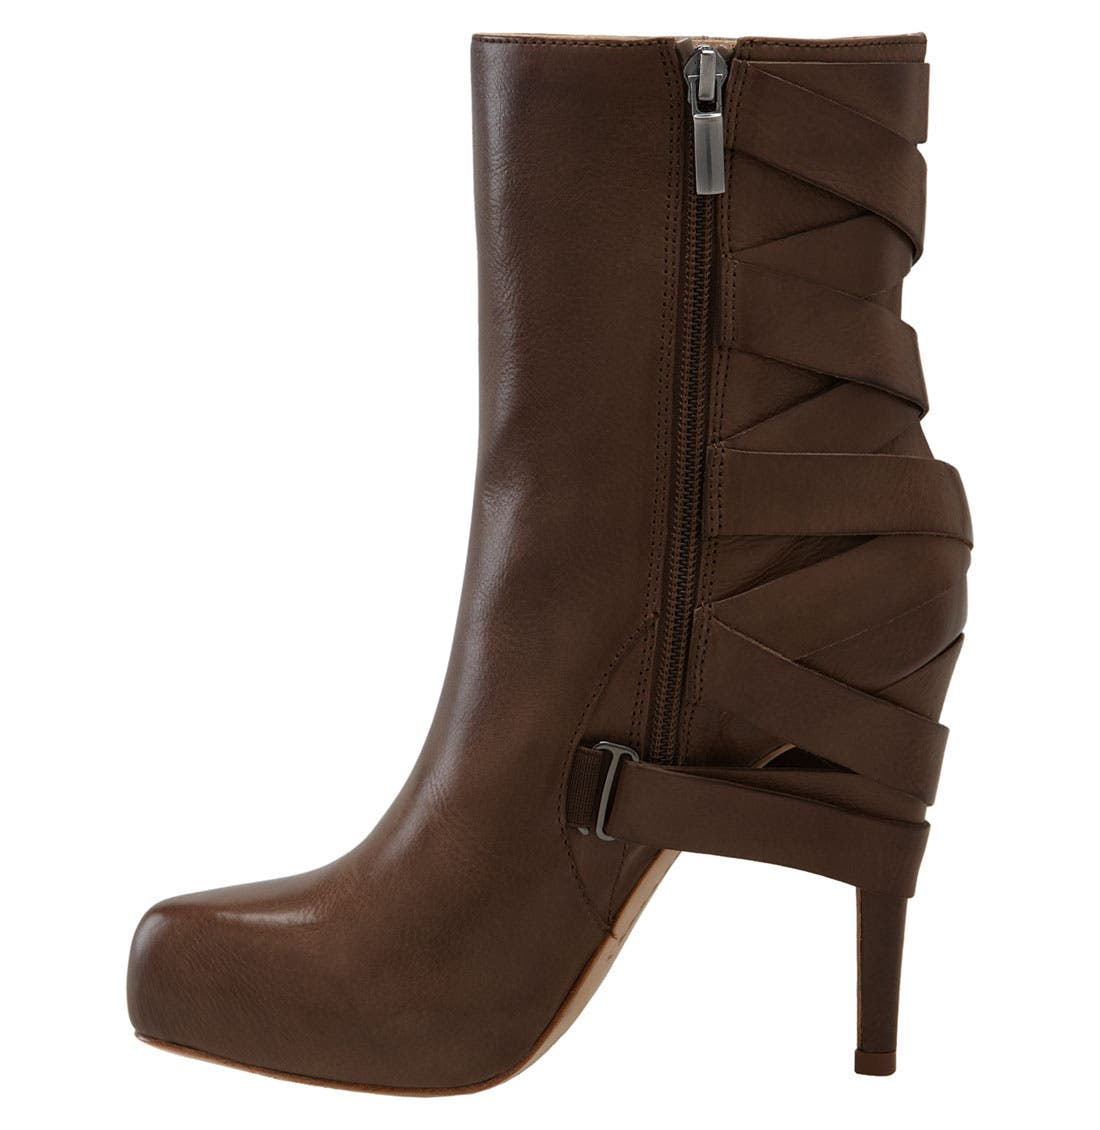 'Strut' Ankle Boot,                             Alternate thumbnail 4, color,                             Brown